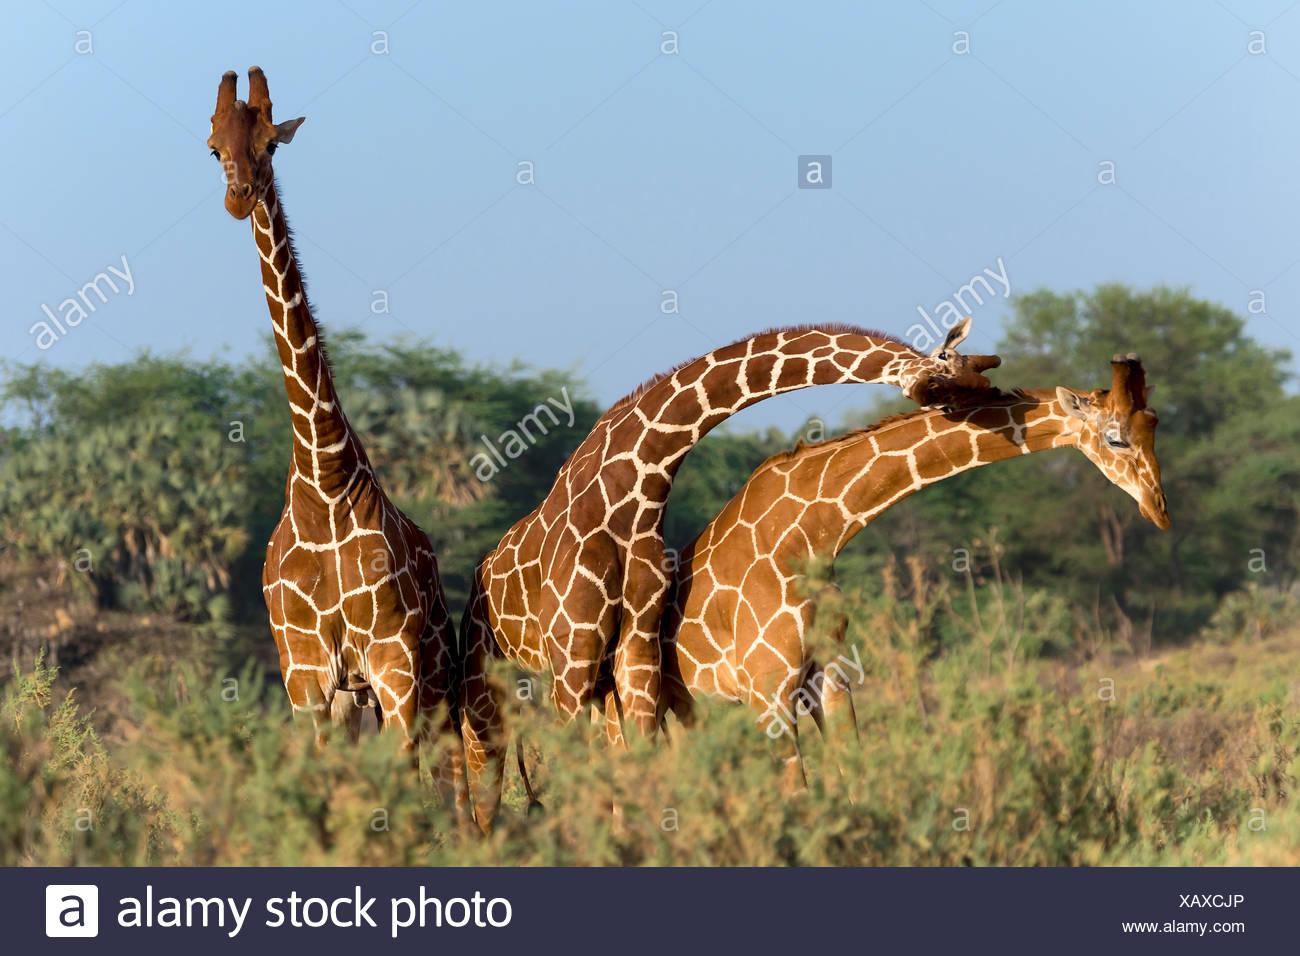 Drei somalische Giraffen oder netzförmigen Giraffen (Giraffa Reticulata Plancius), Samburu National Reserve, Kenia Stockfoto